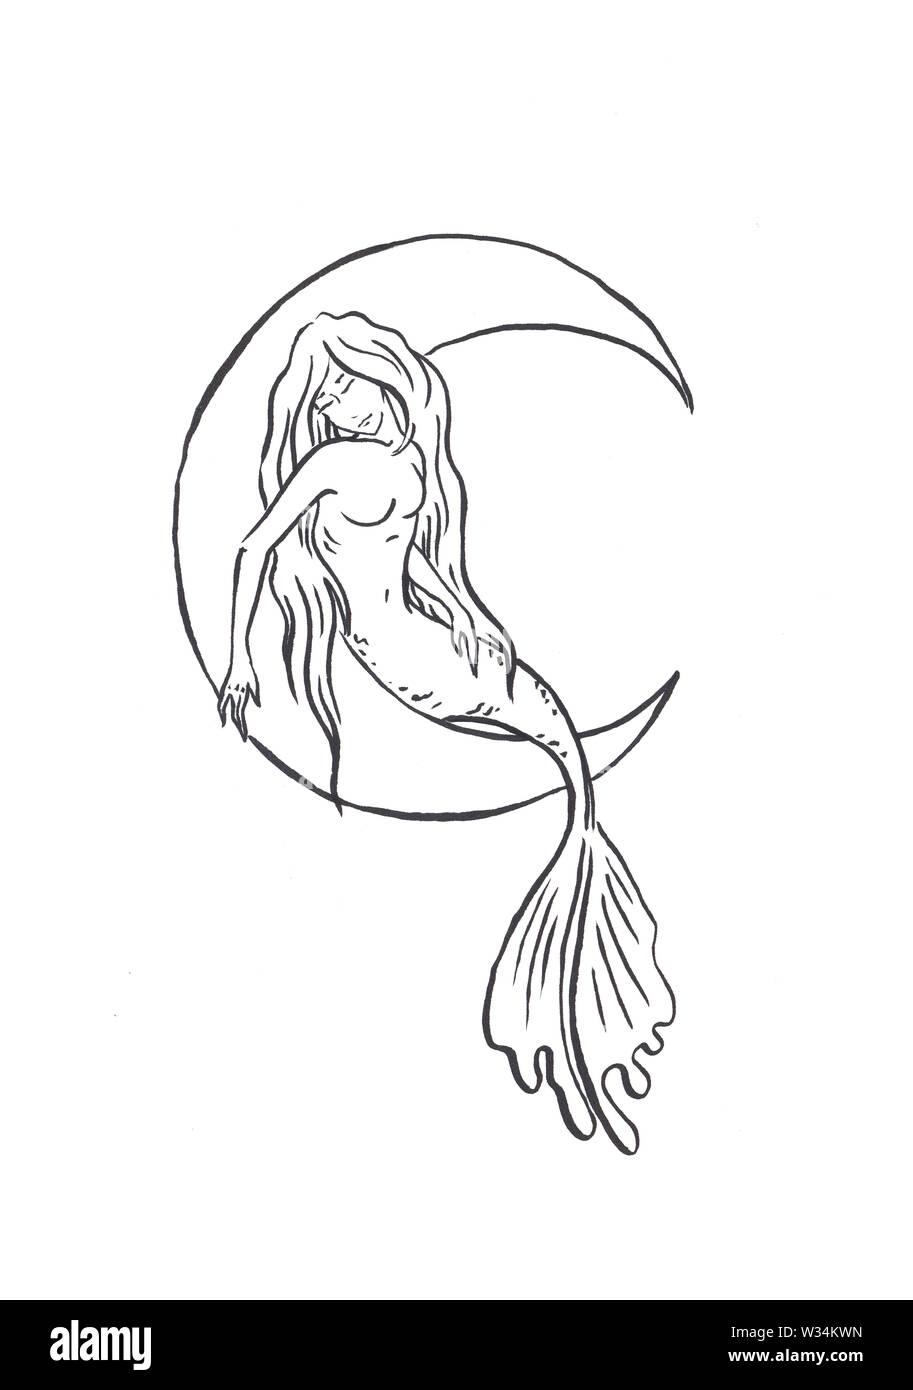 Fairy Mermaid Coloring Page » Printable Coloring Page » Artus Art | 1390x913